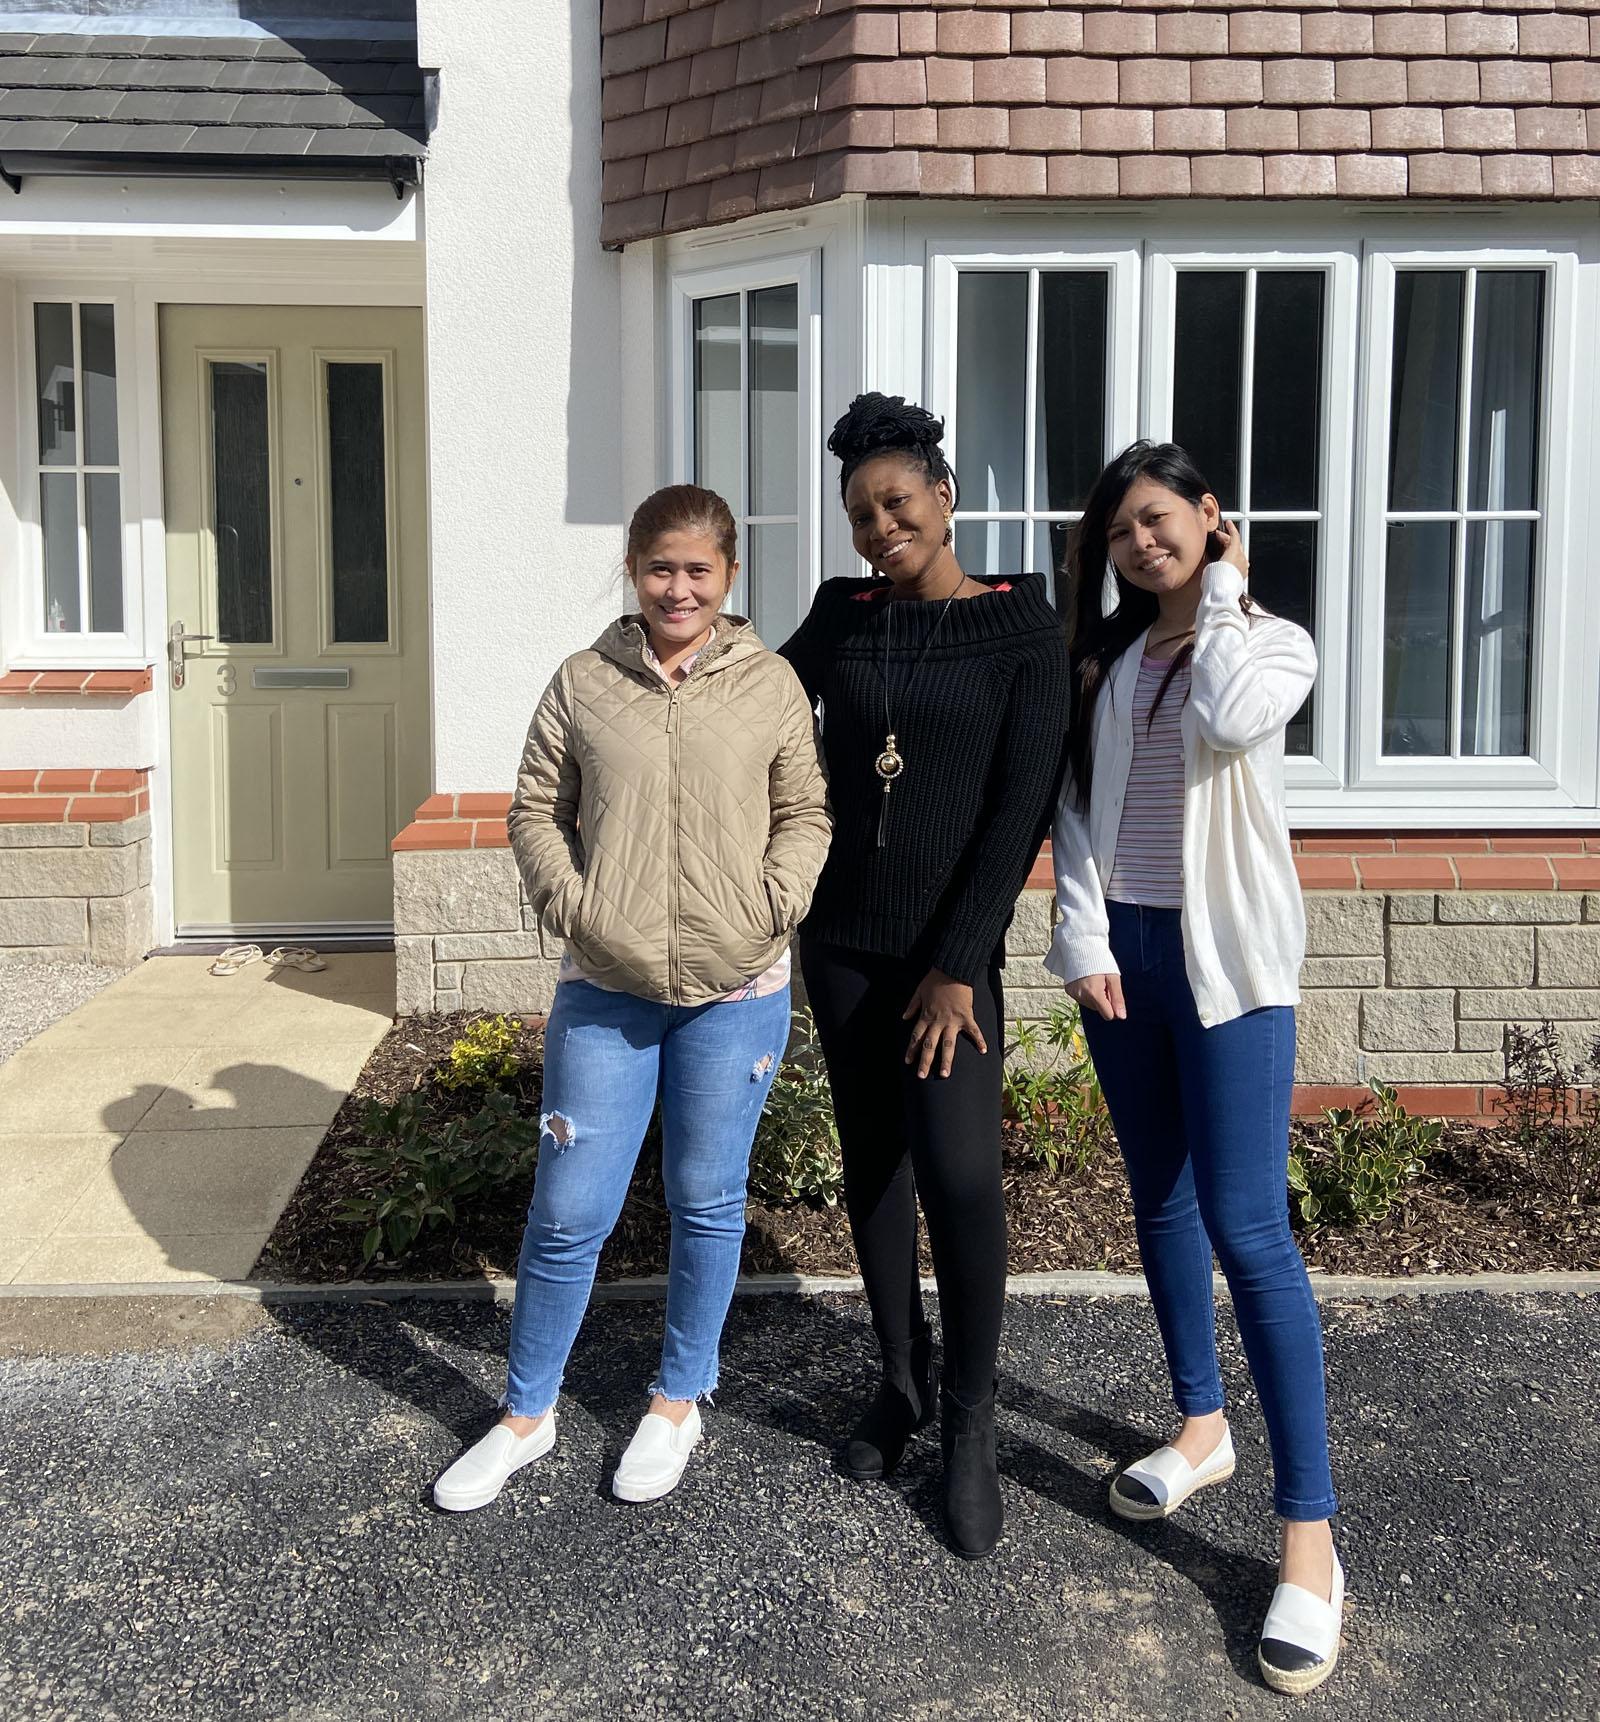 North Wales housing association helps home Betsi Cadwaladr overseas nursing staff